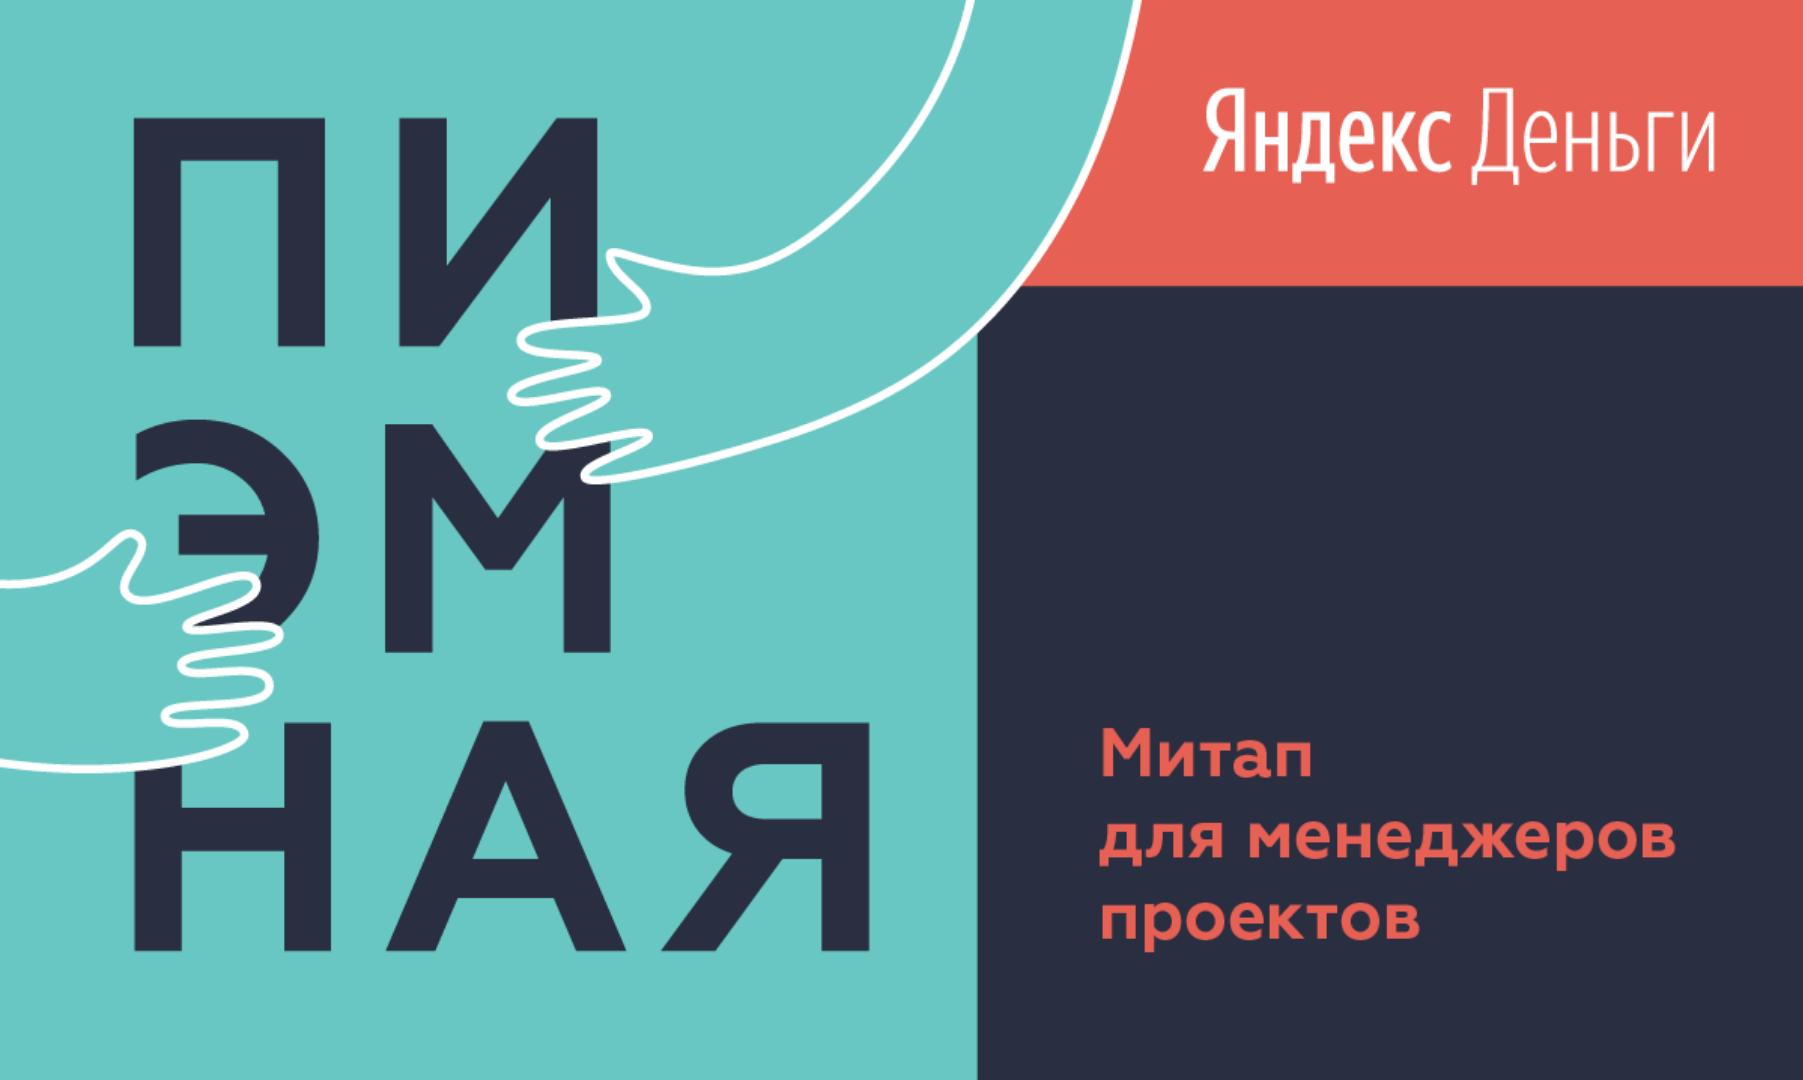 Драйвим разработчиков и даём фидбек по-научному — видео с митапа Яндекс.Денег